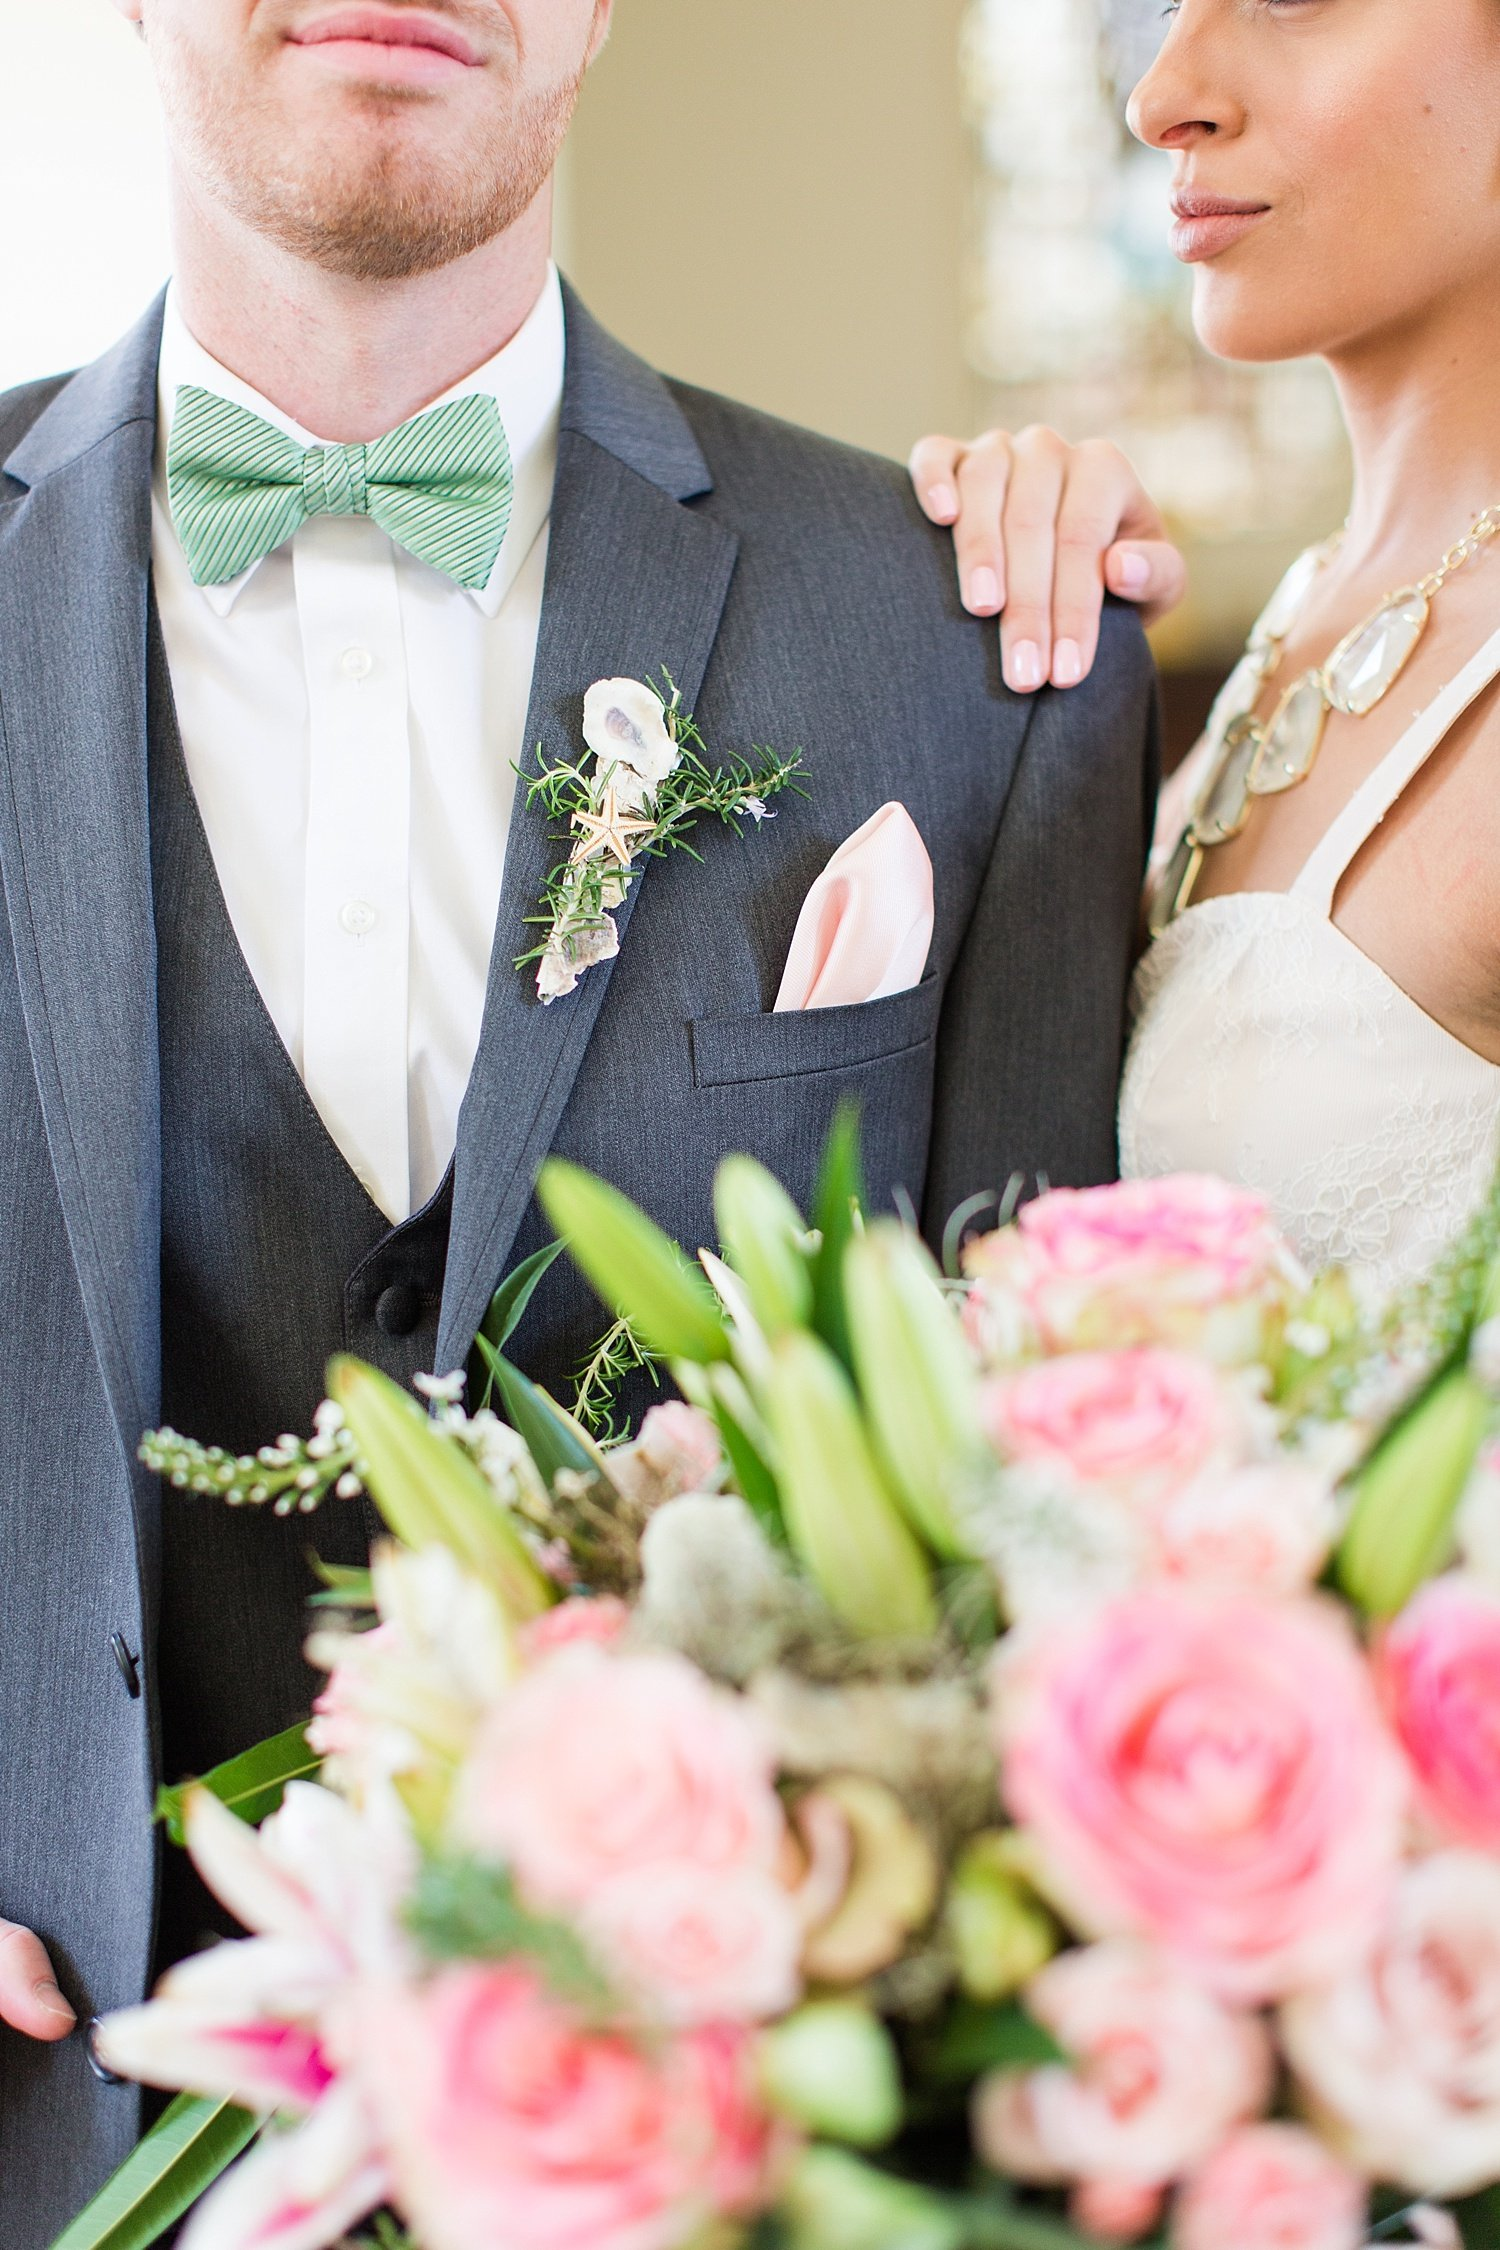 rachel-strickland-photography-katie-may-ivory-and-beau-bridal-boutique-bethesda-academy-wedding-whitfield-chapel-wedding-savannah-bridal-boutique-savannah-weddings-savannah-wedding-savannah-wedding-planner-savannah-bridal-gowns-savannah-bride-9.jpg